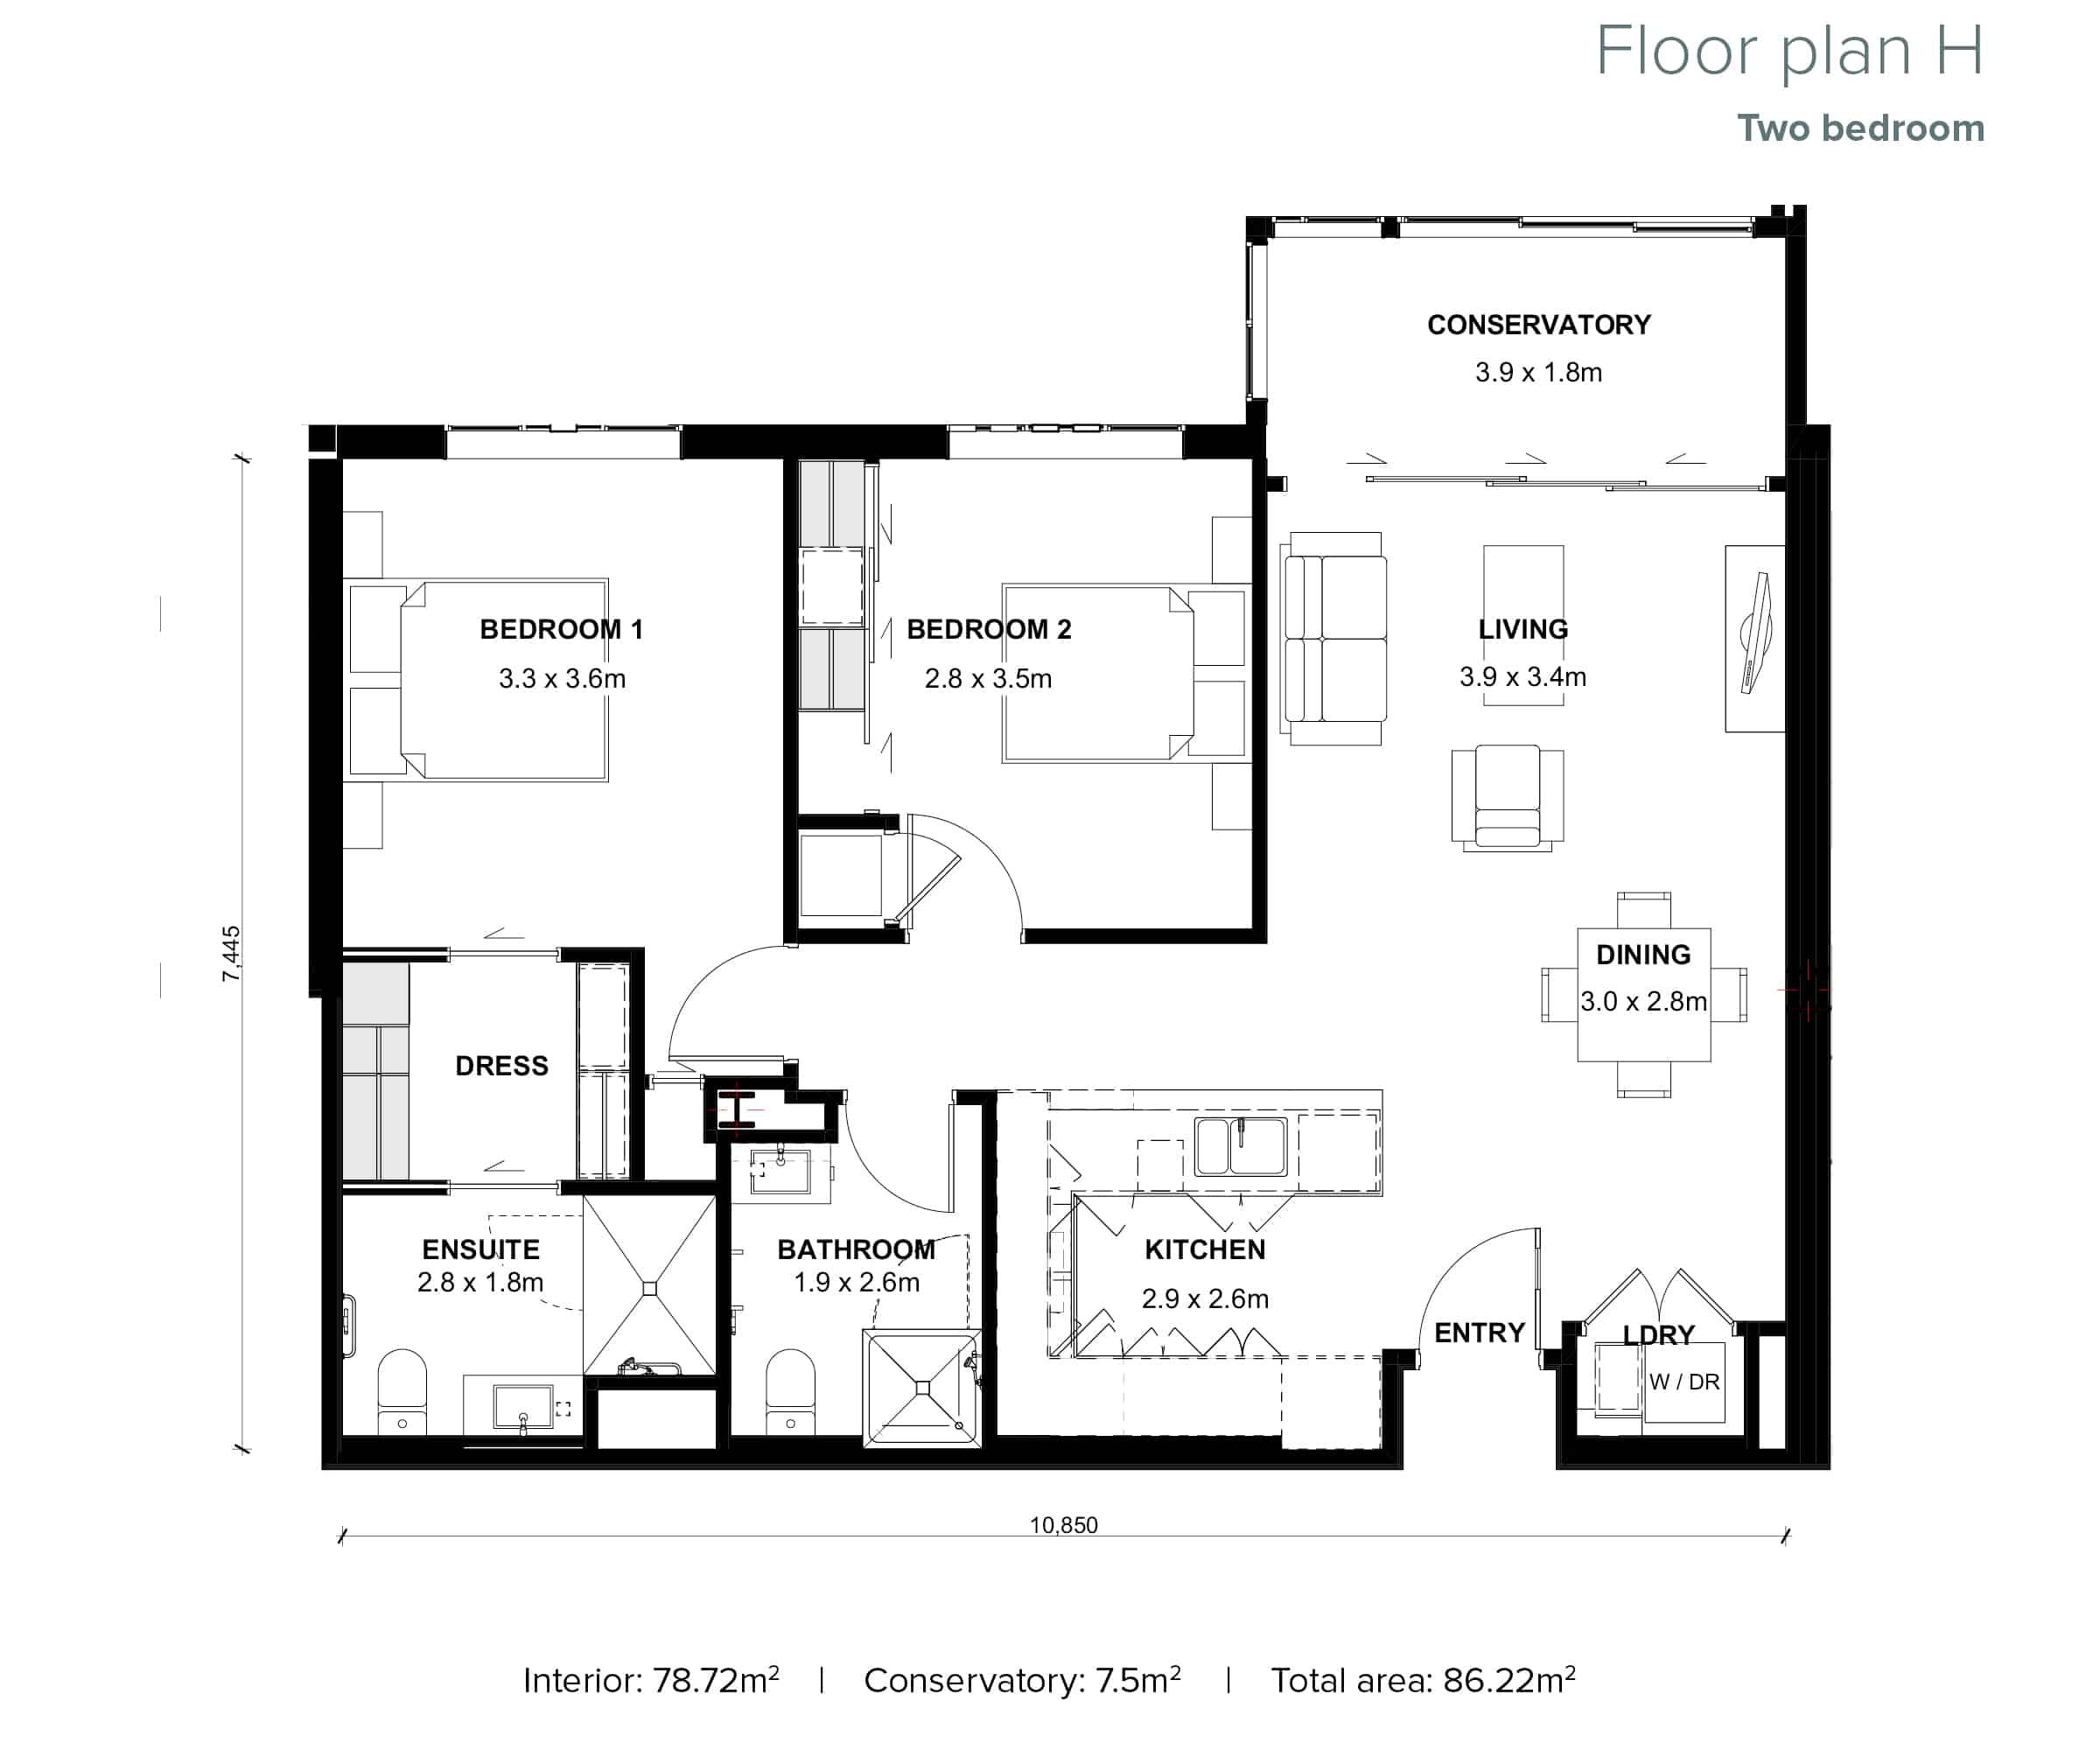 The Grove Orewa - Floor plan H - Two Bedroom